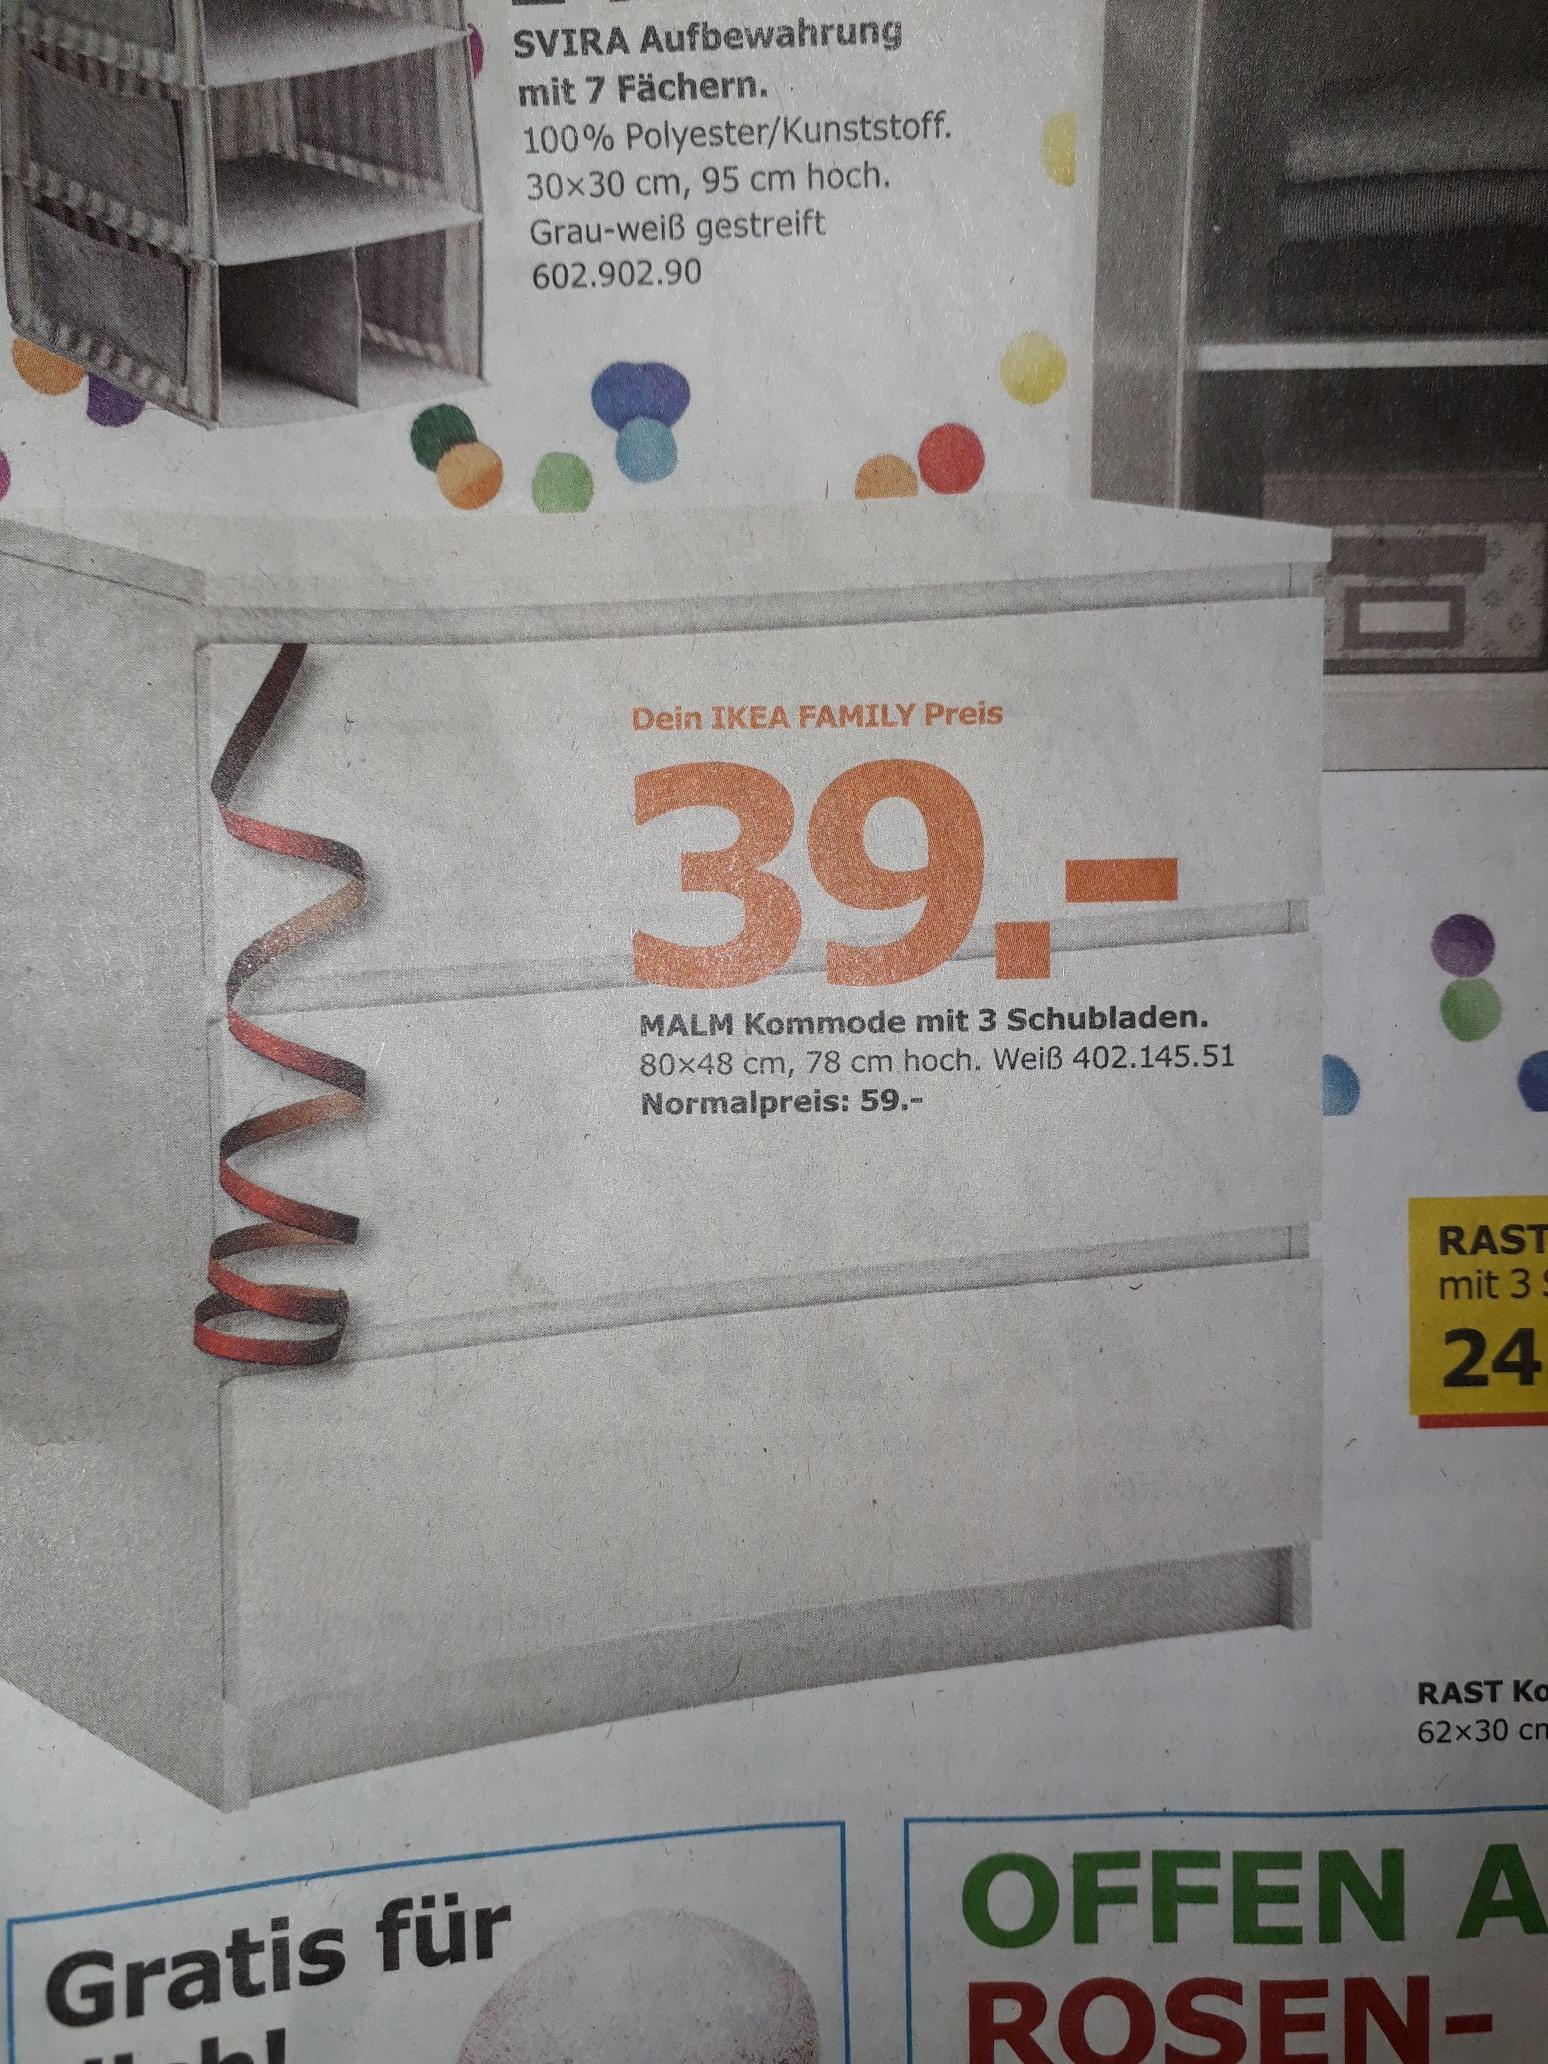 (Lokal IKEA Freiburg) MALM Kommode 3 Schubladen